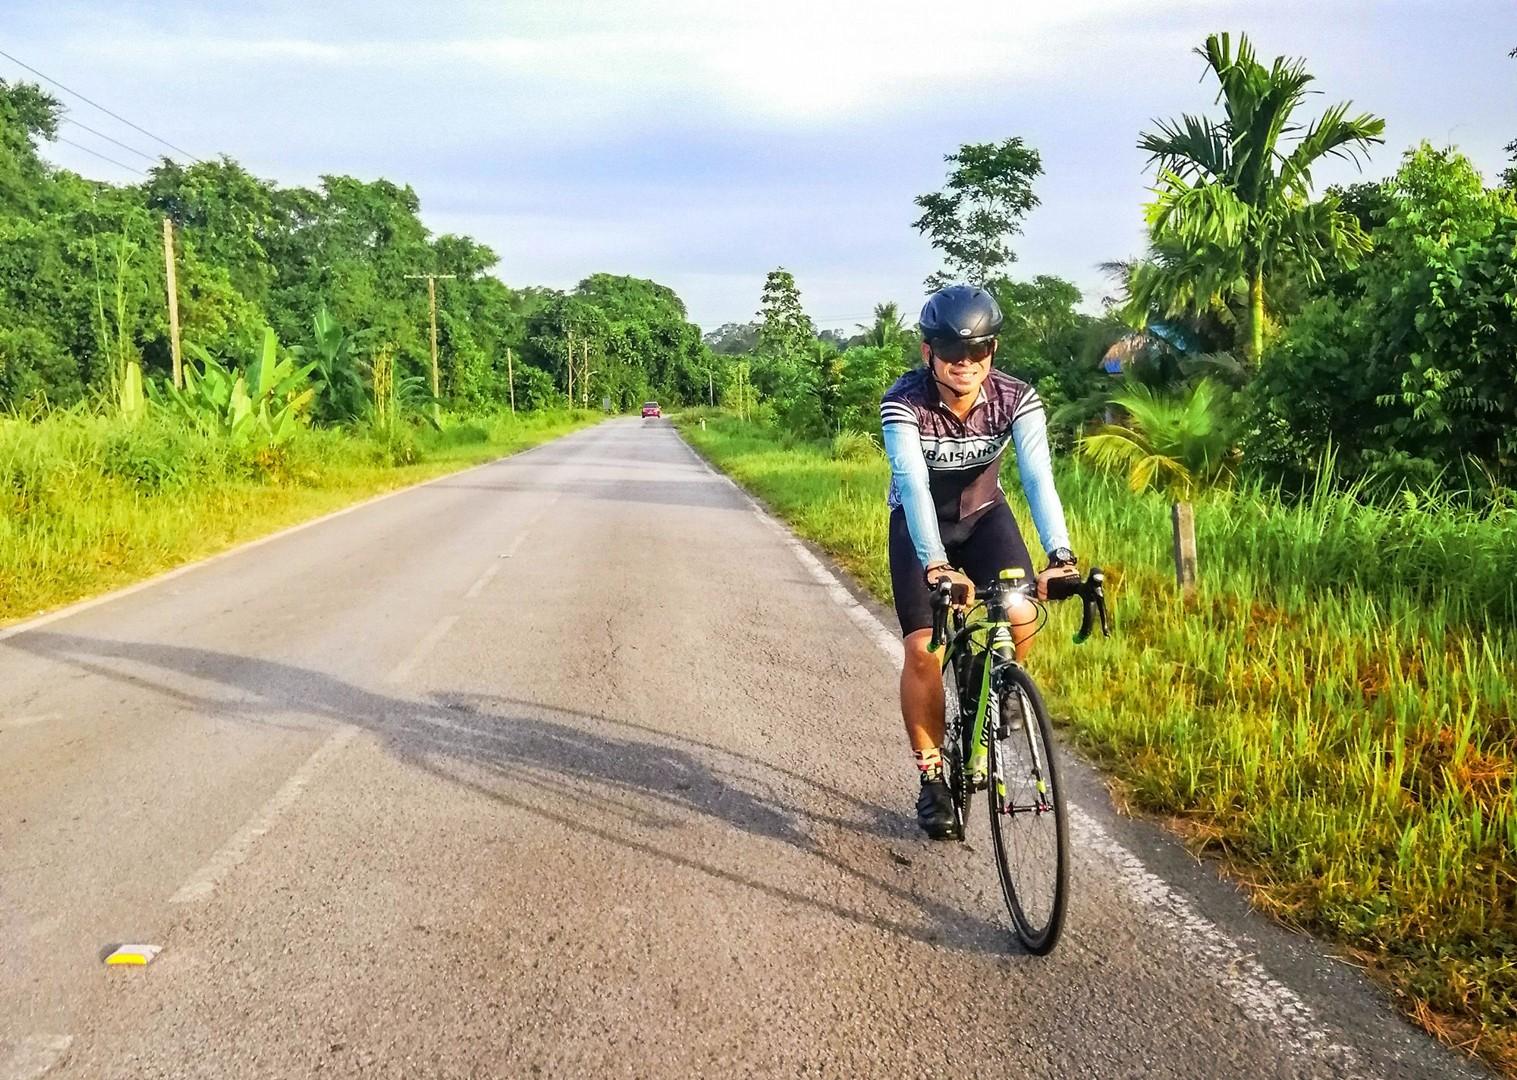 cycling-borneo-road-holidays-saddle-skedaddle-sarawak-to-sabah.jpg - Borneo - Sarawak to Sabah - Guided Road Cycling Holiday - Road Cycling